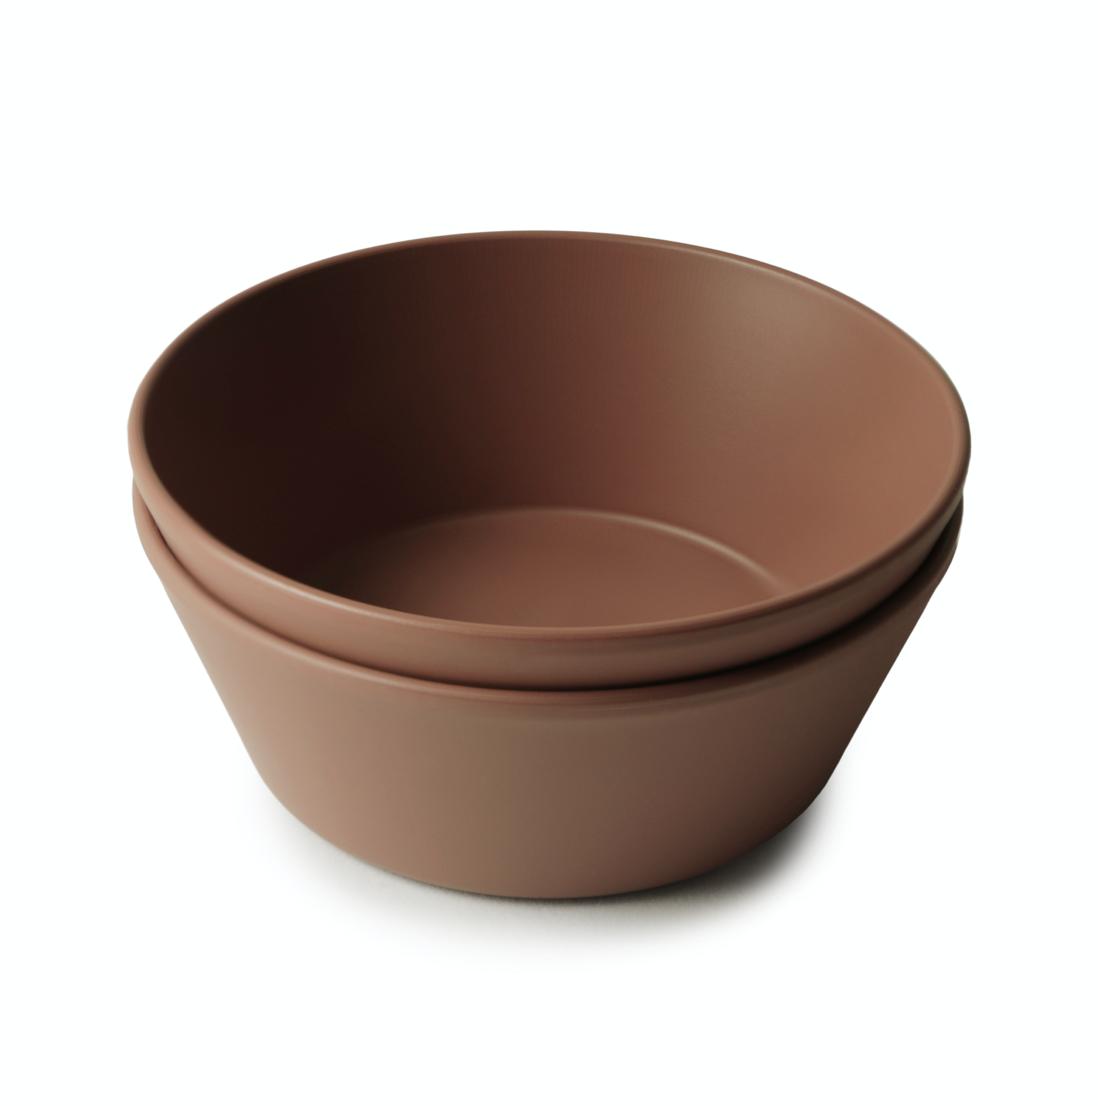 Set 2 Round Dinnerware Bowl Caramel